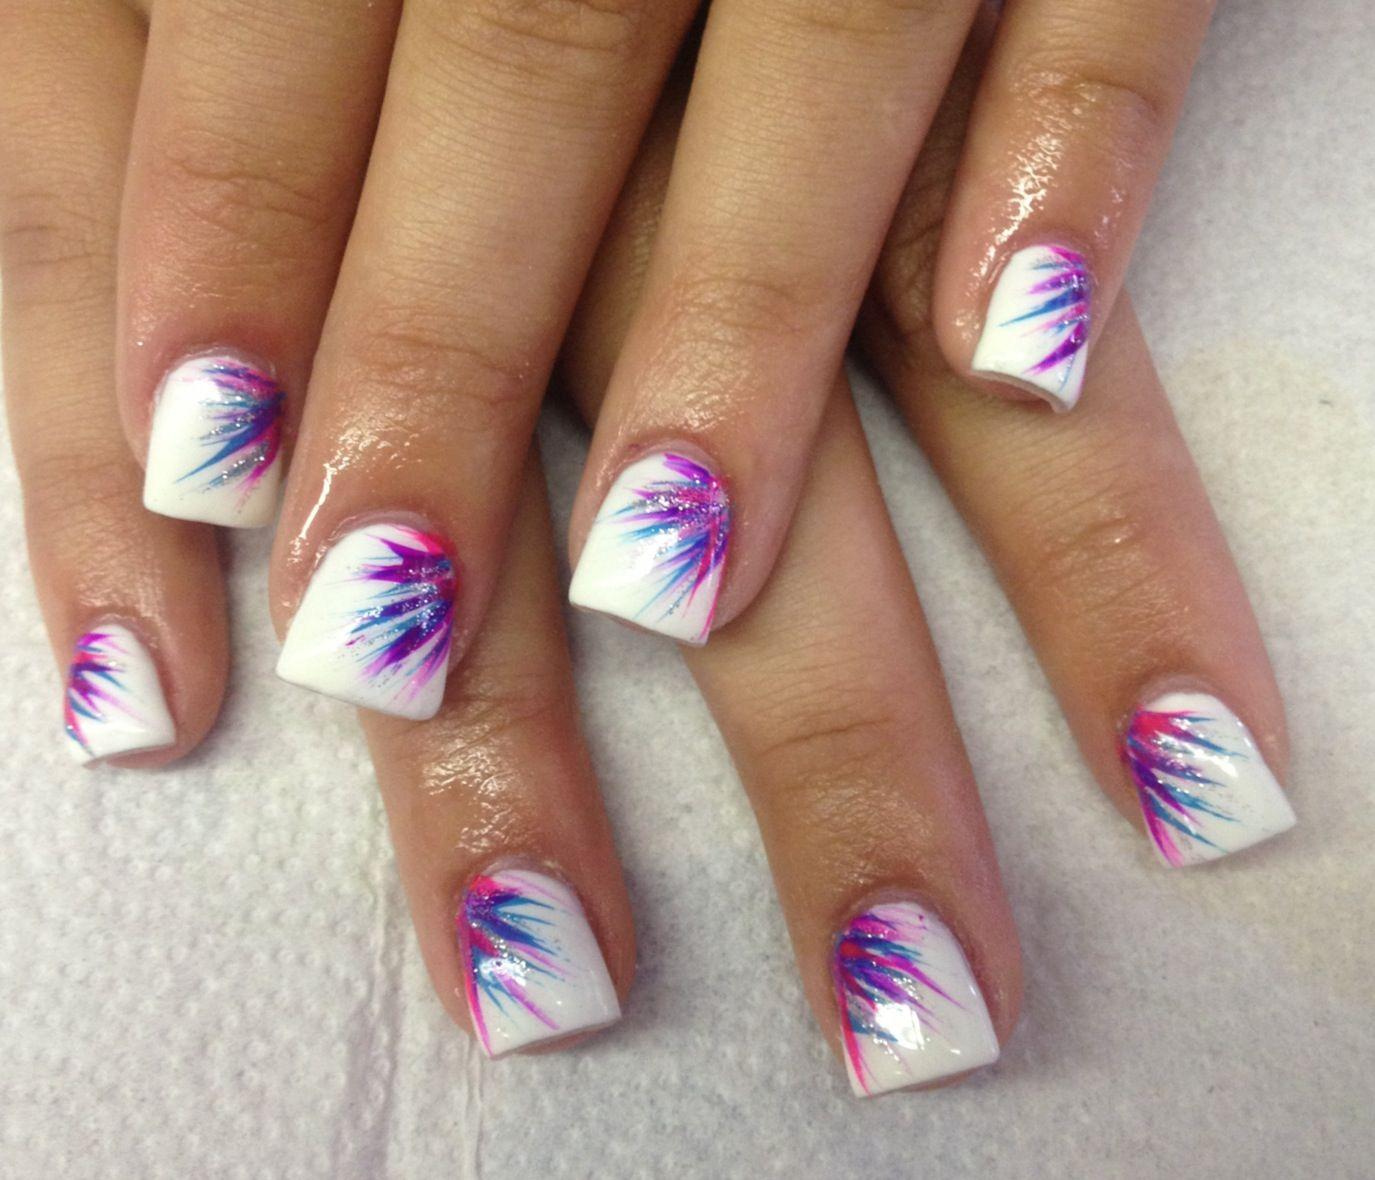 Fun flared starburst nails nails pinterest fun nails nail fun flared starburst nails fun nail designsnail polish prinsesfo Image collections